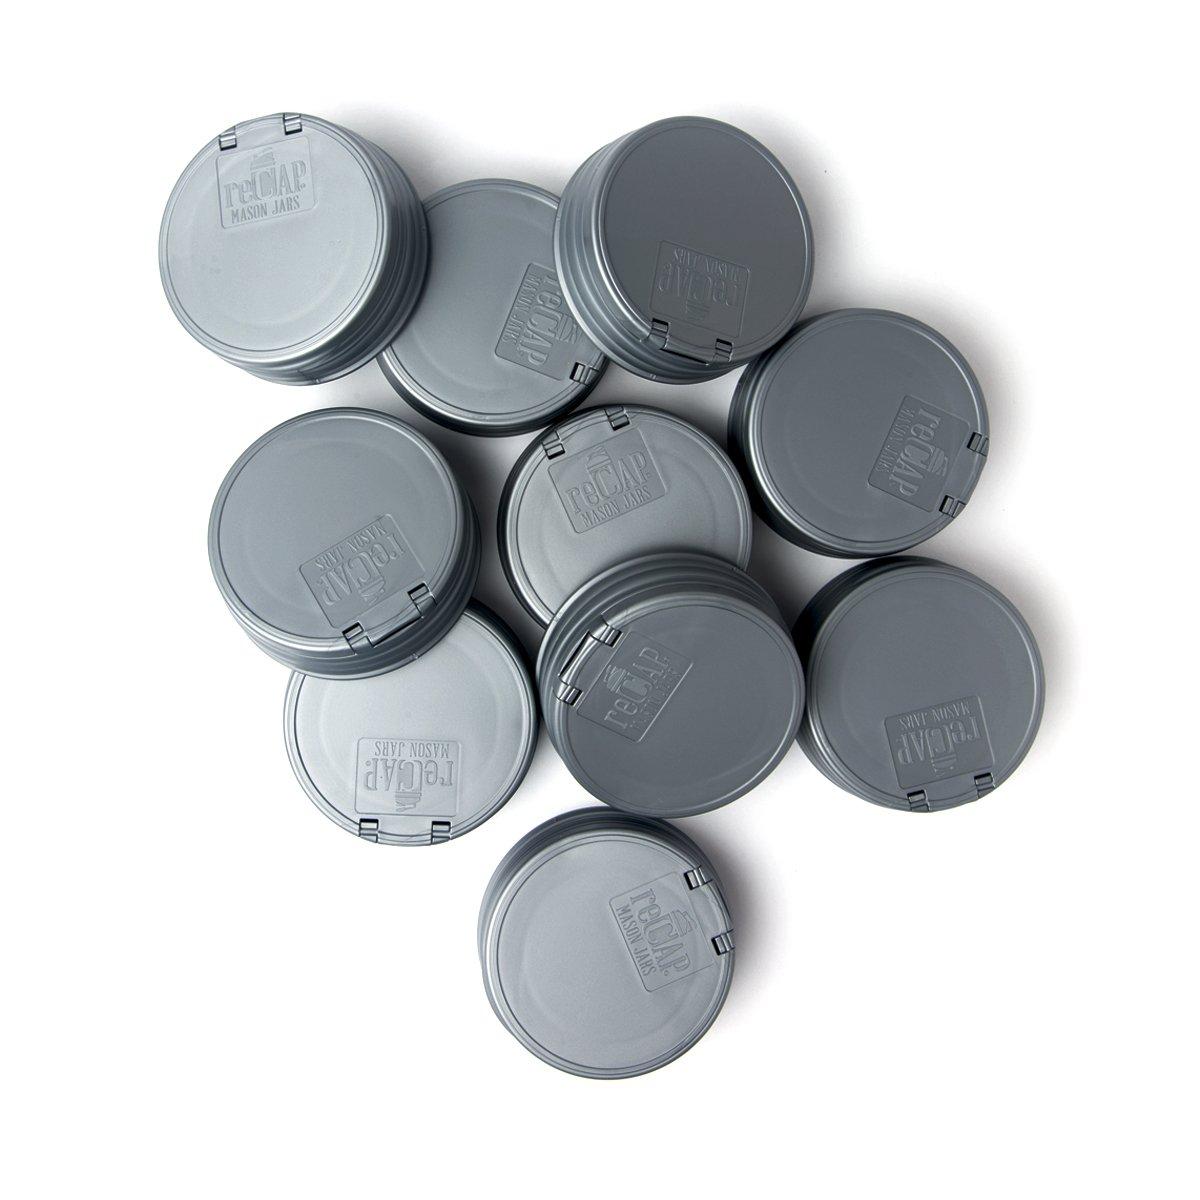 reCAP Mason Jars Lid FLIP Cap, Regular Mouth, Silver, 10 Pack